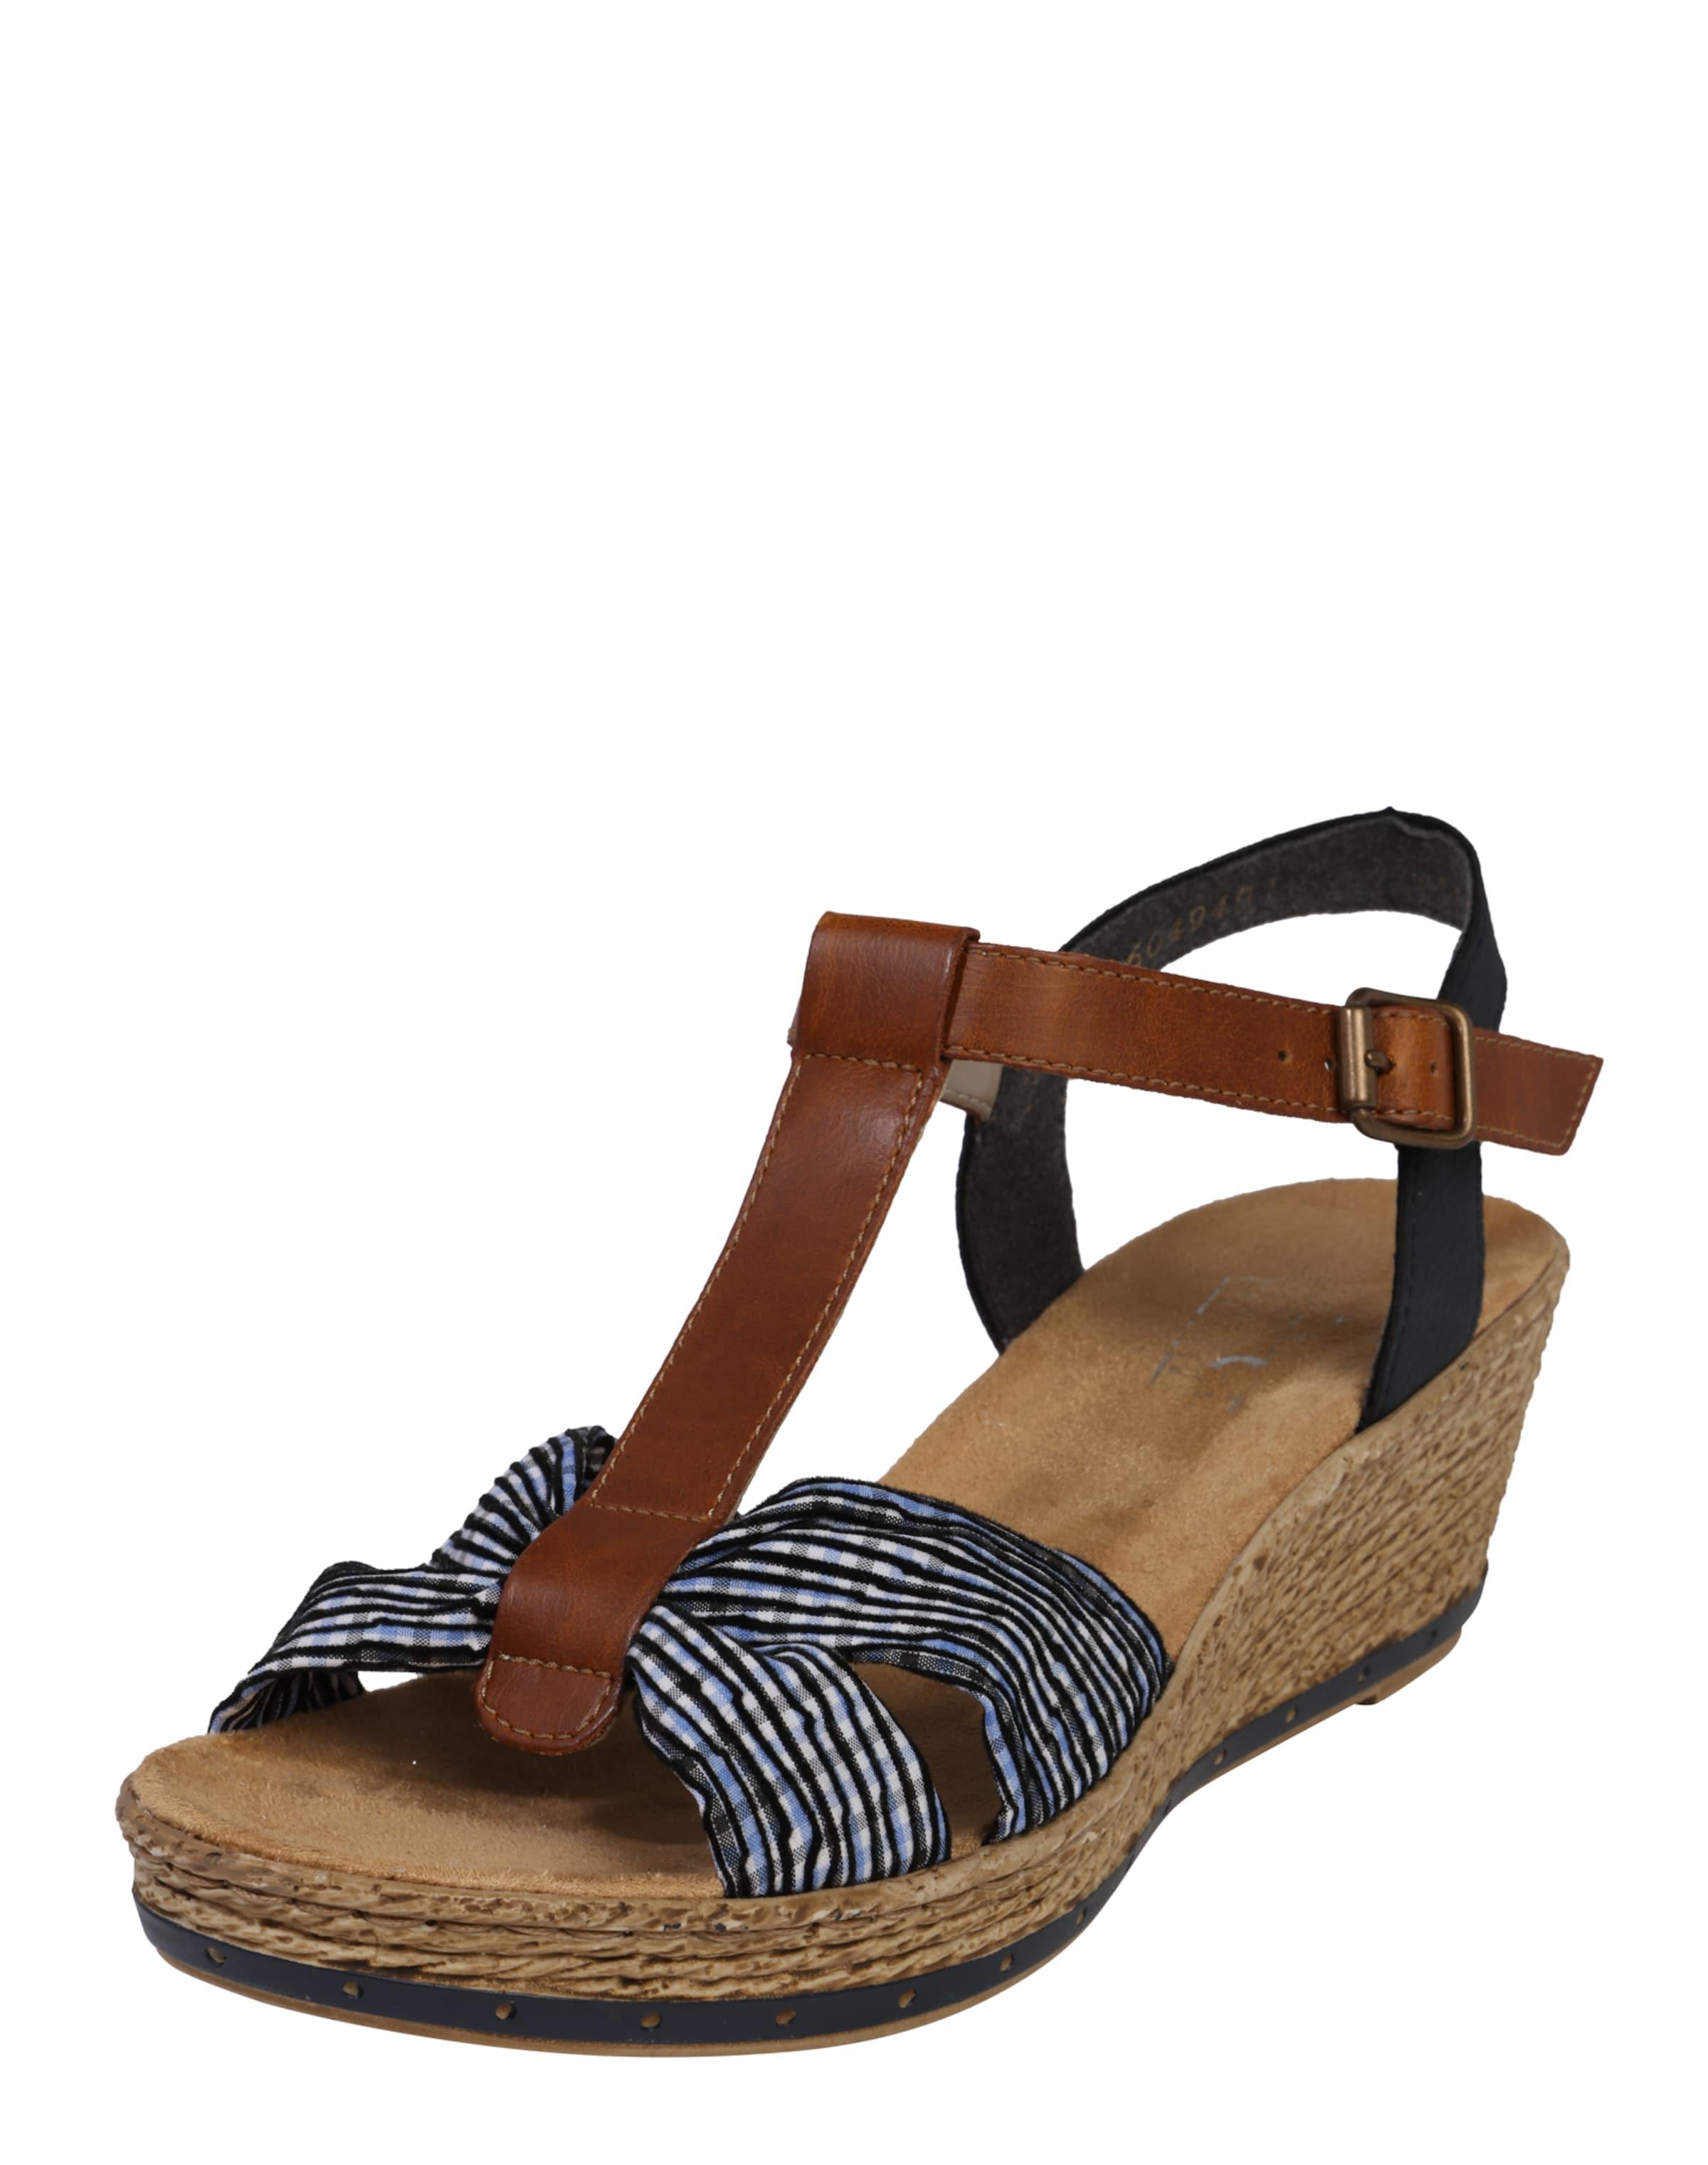 Haltbare Mode billige Schuhe RIEKER | Sandale im Retro-Look Schuhe Gut getragene Schuhe